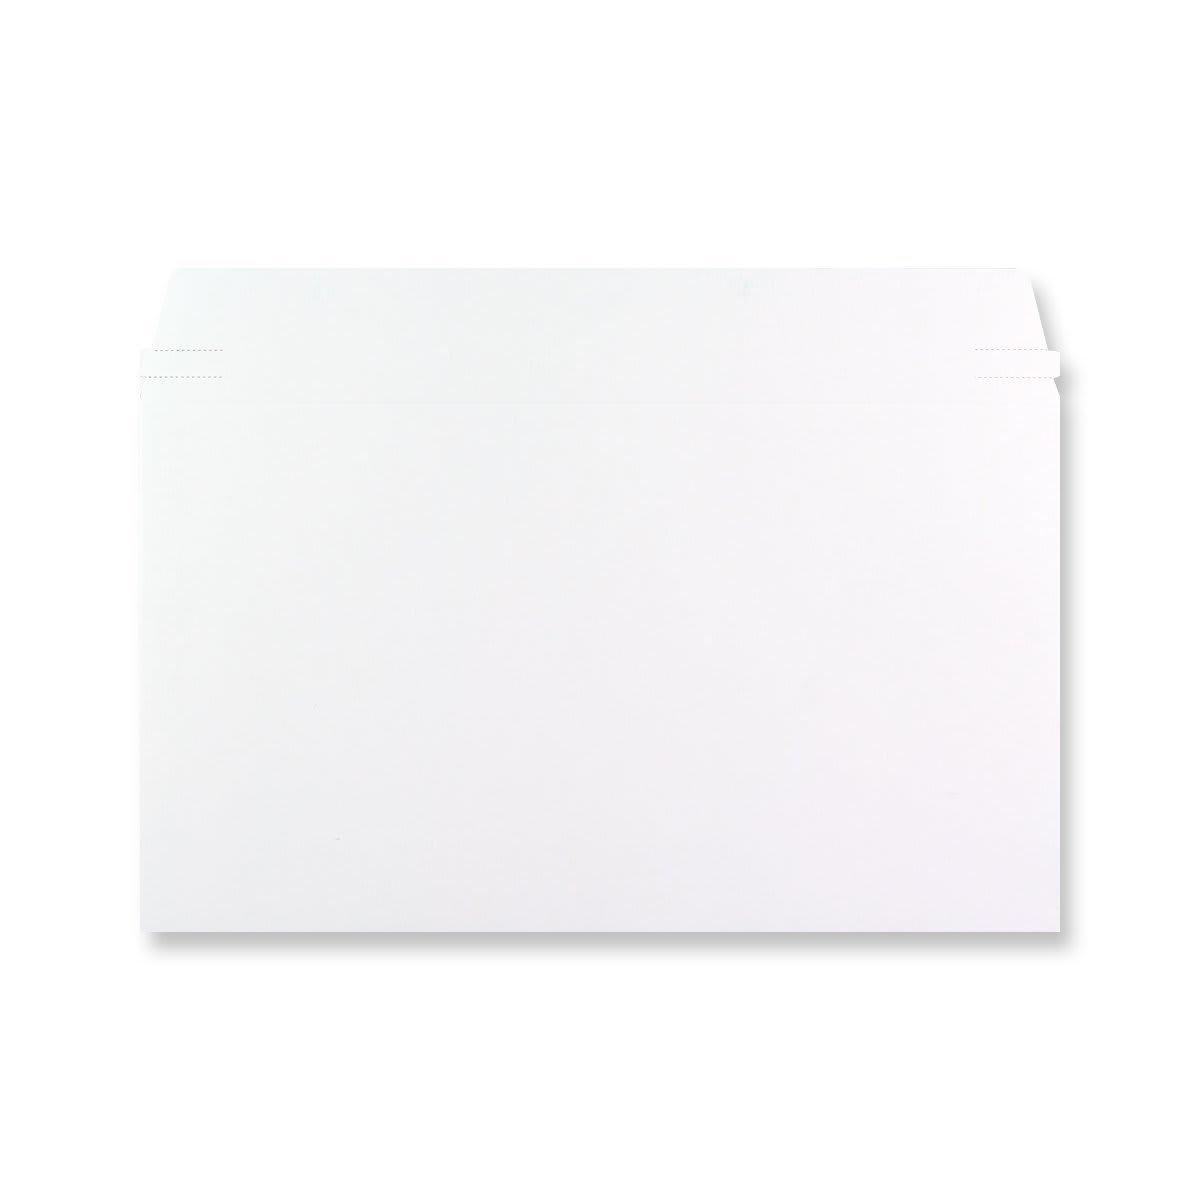 175 x 305mm WHITE ALL BOARD ENVELOPES